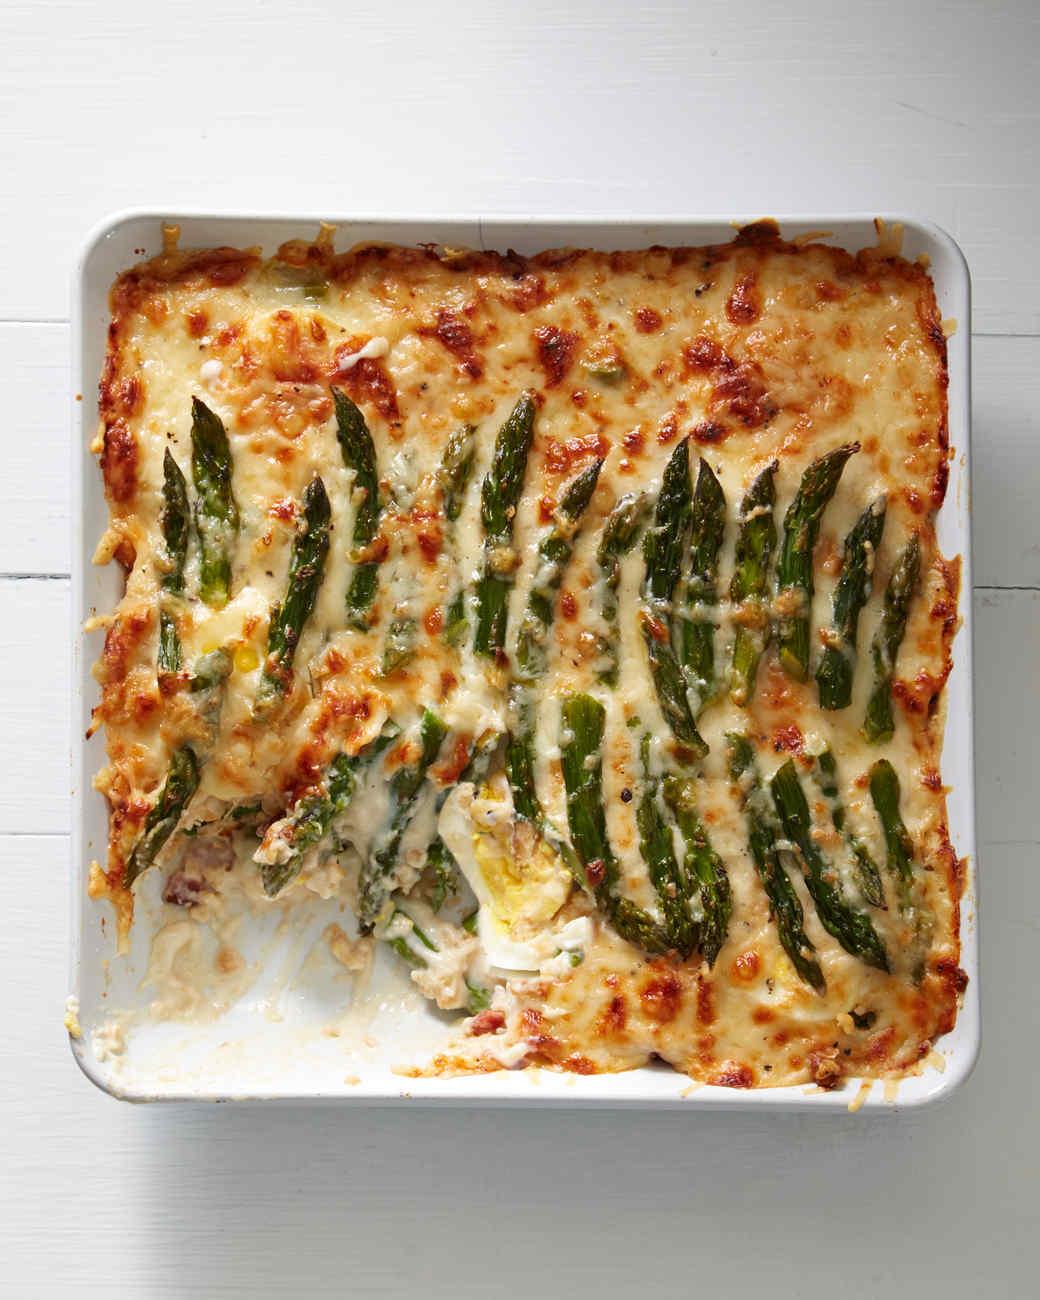 asparagus-casserole-5520-d112865.jpg